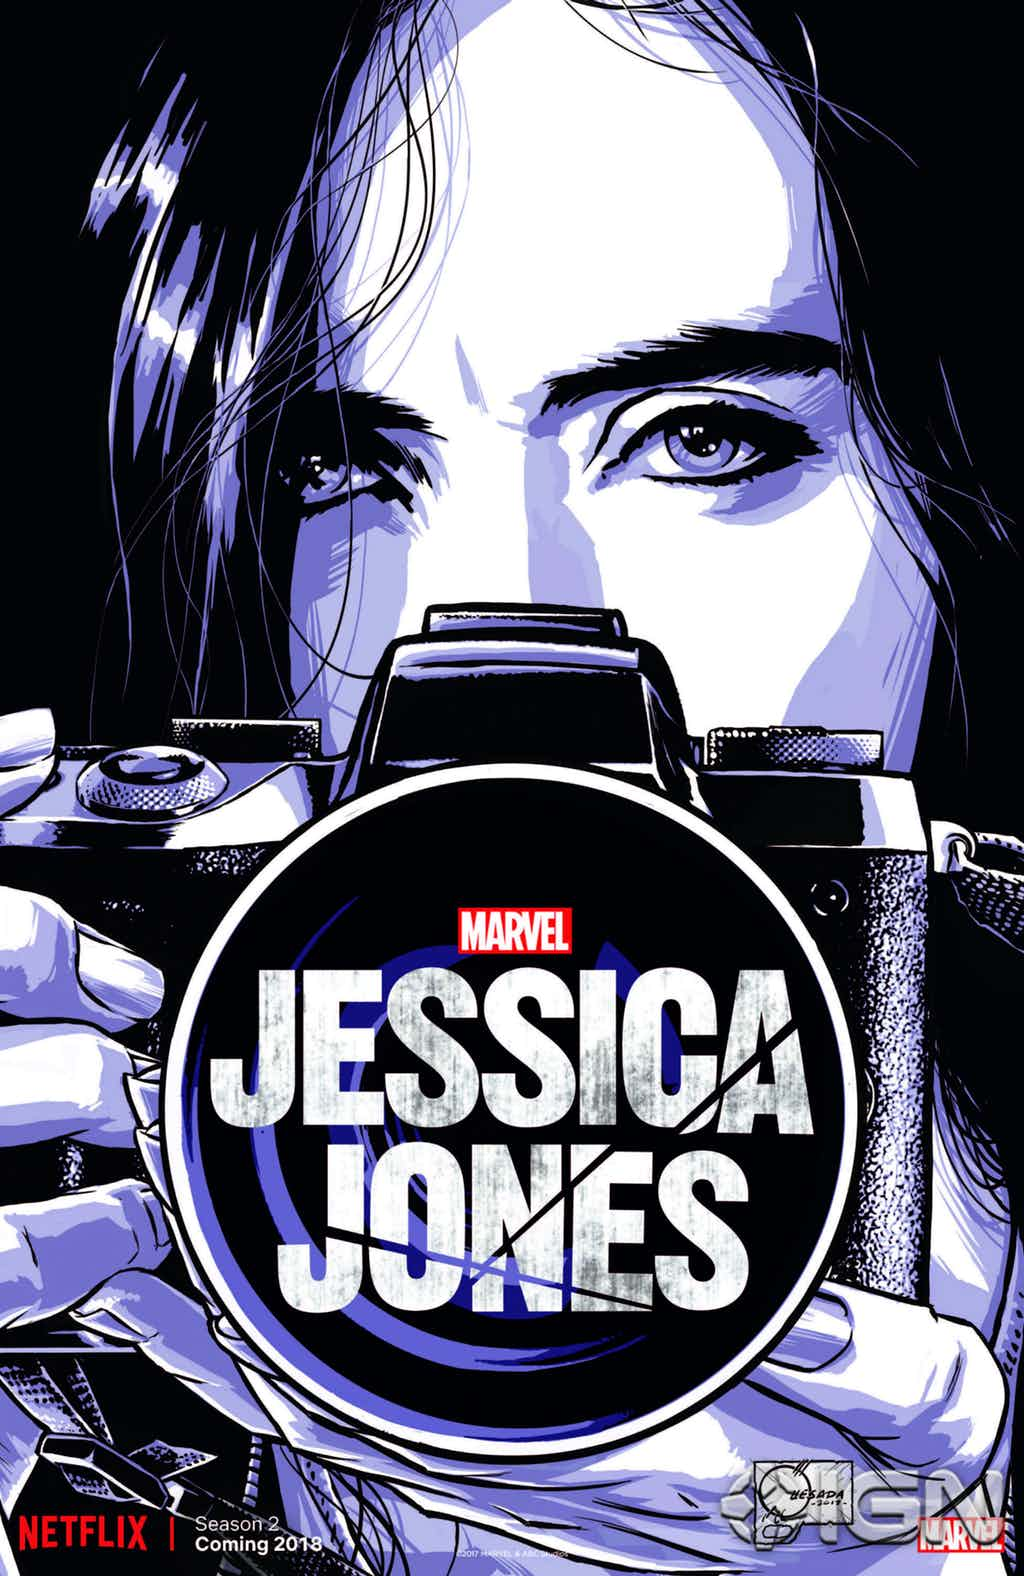 Jessica-Jones-Season-2-NYCC-Poster